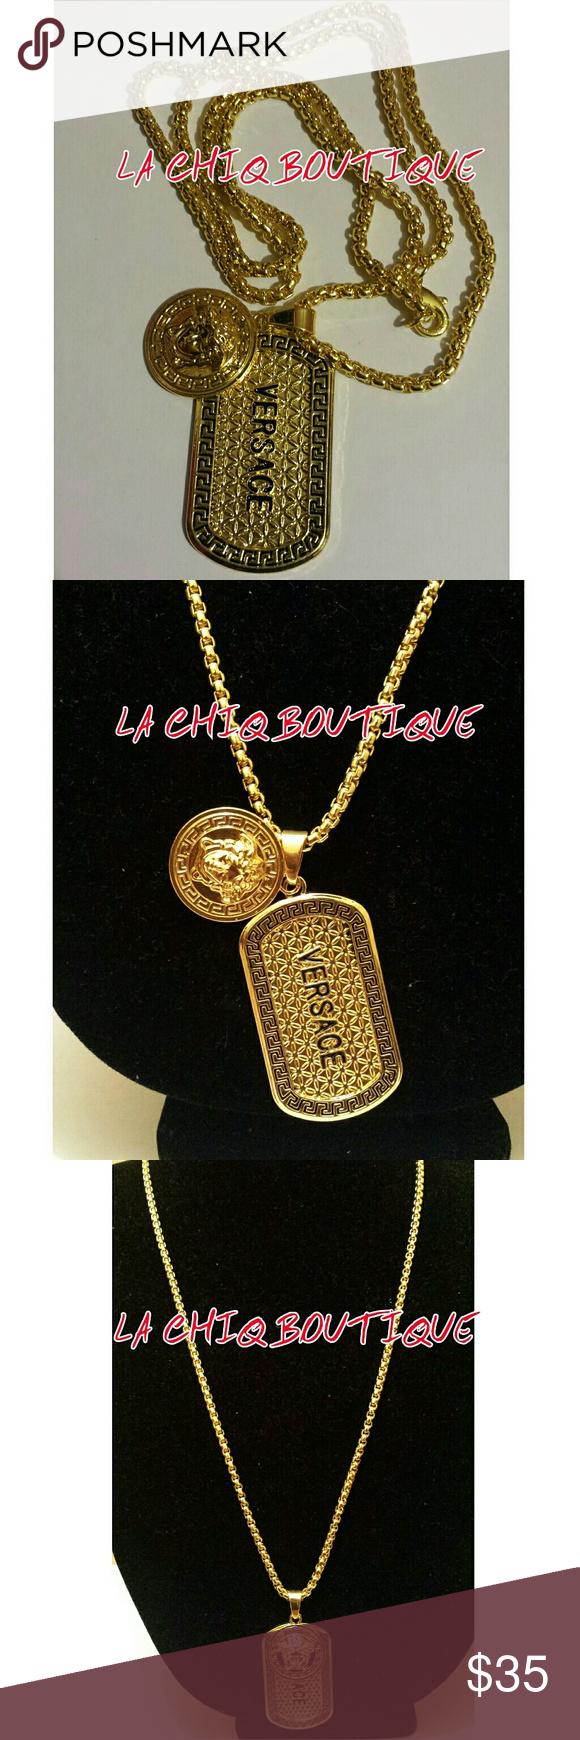 K gold plated medusa pendant dog tag chain brand new menus fashion